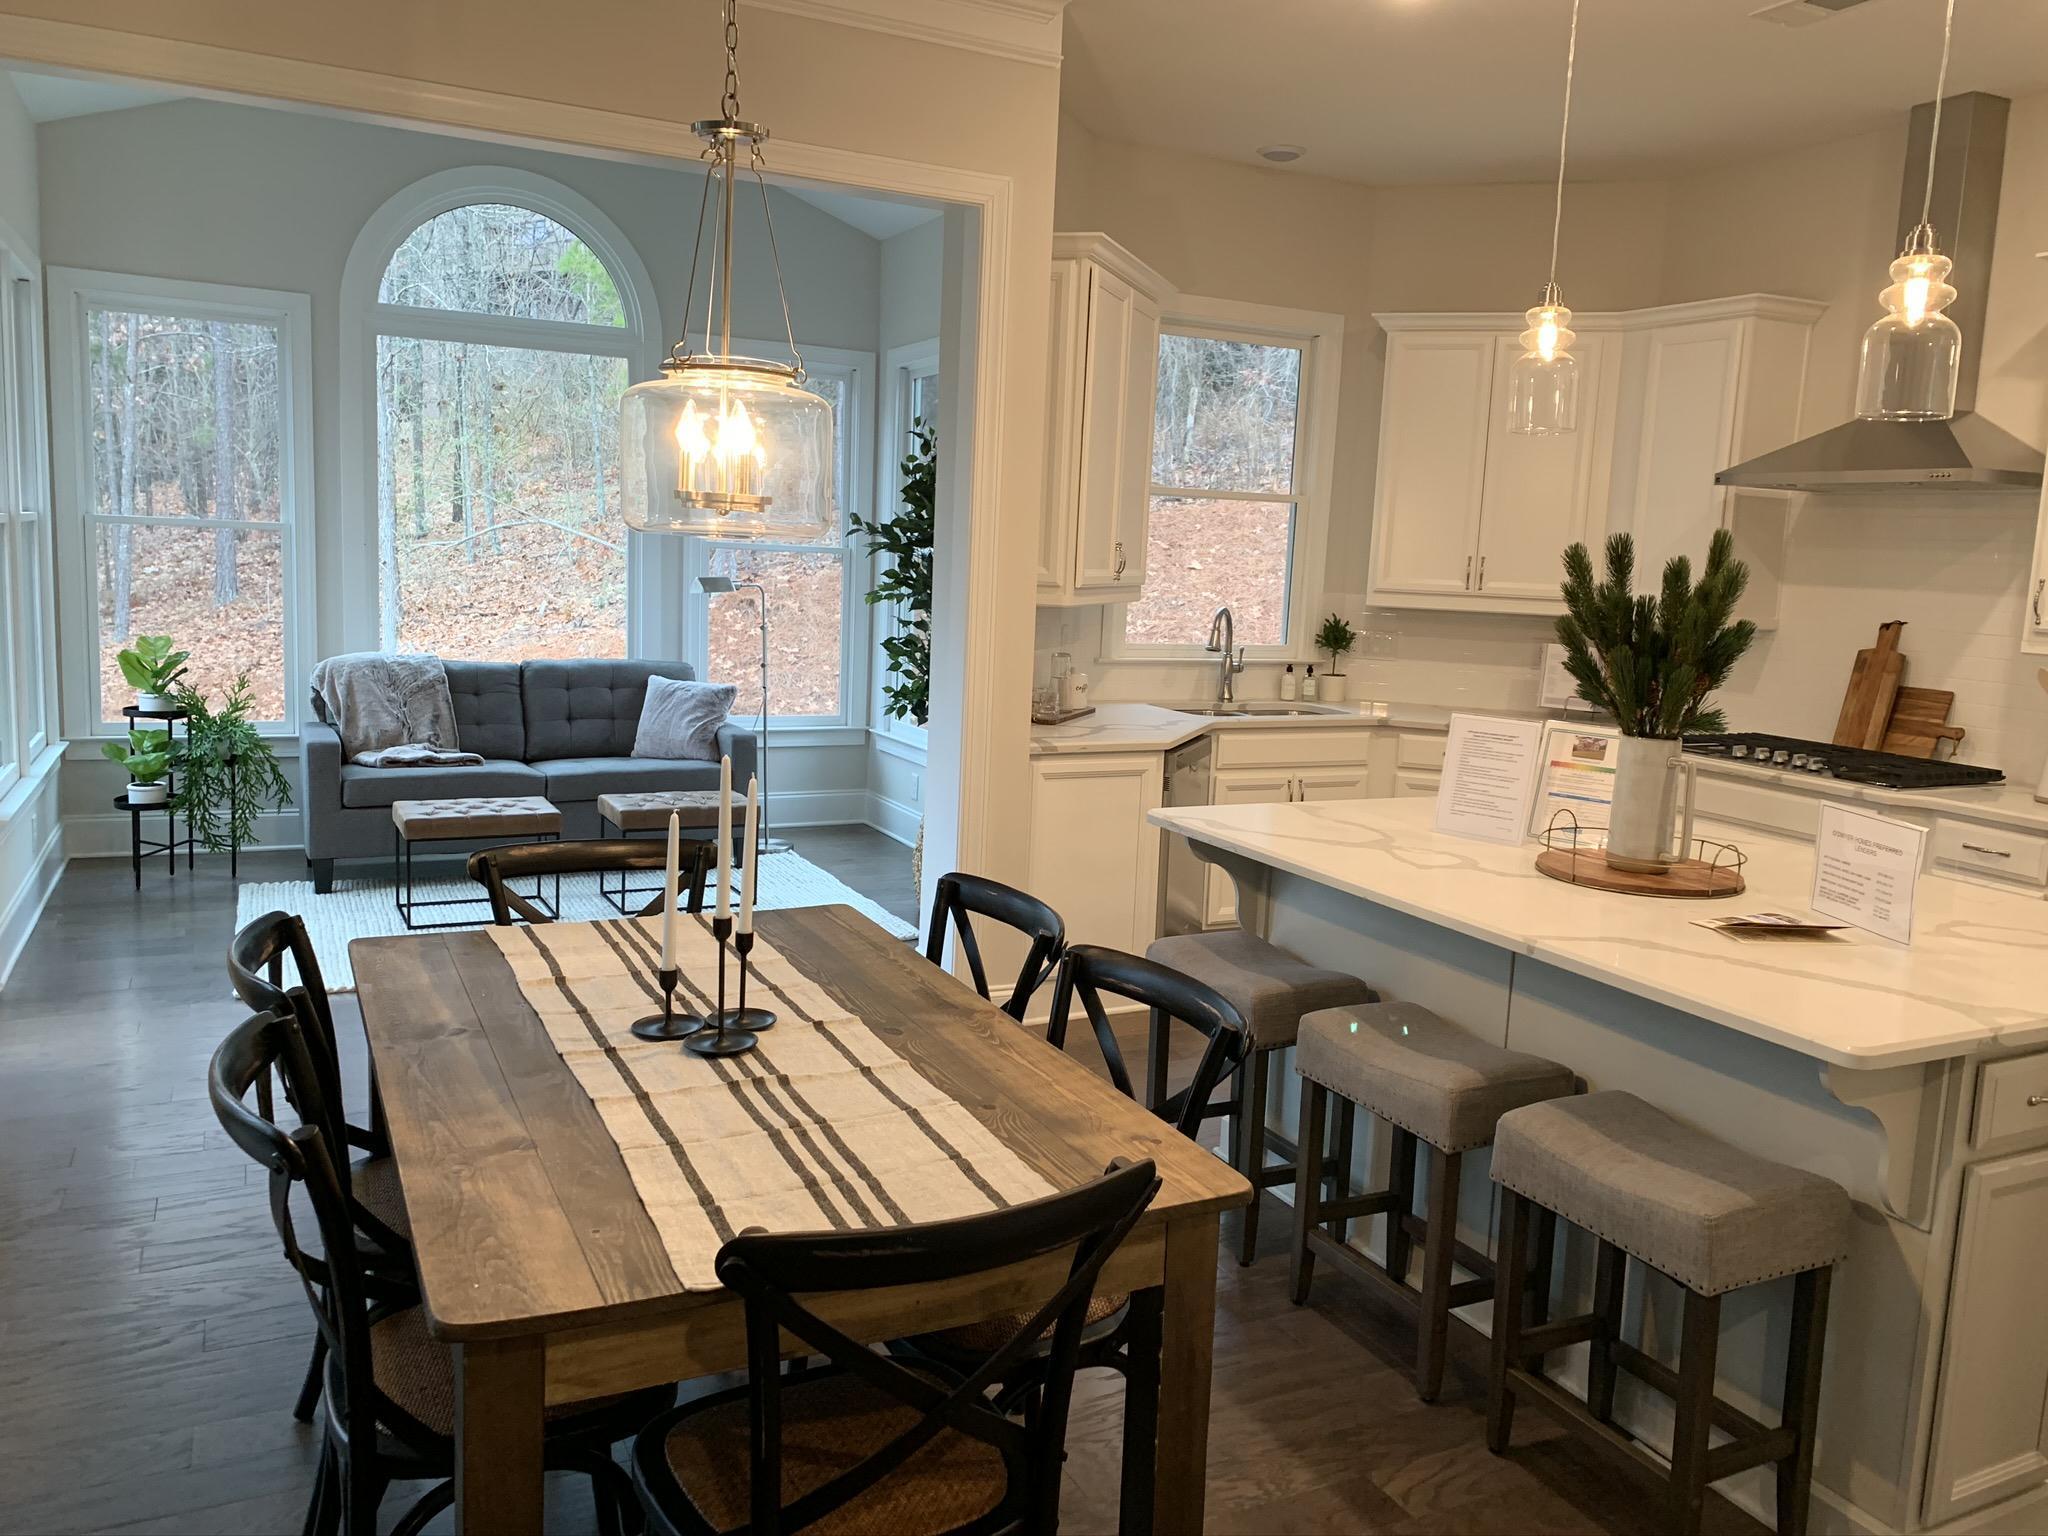 Kitchen featured in The Garrett By O'Dwyer Homes in Atlanta, GA